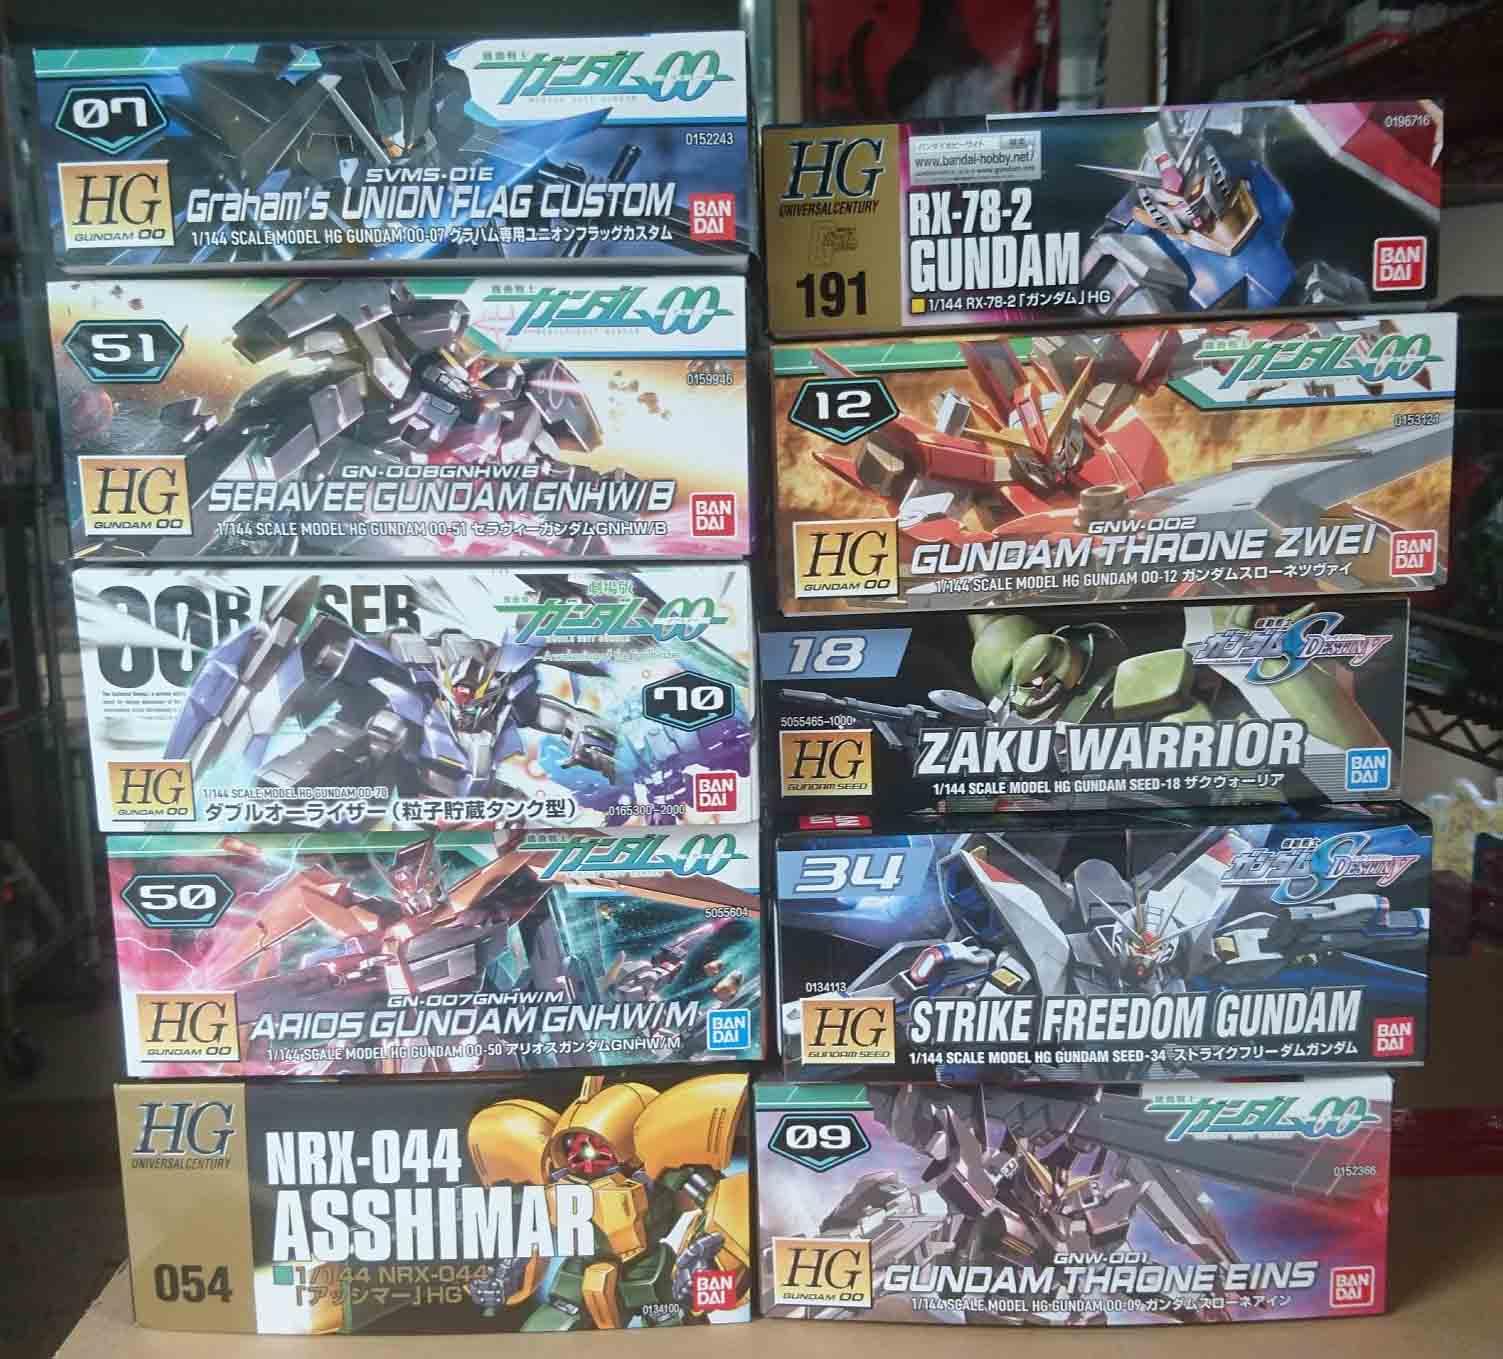 HG 系列商品,益祥模型玩具外盒實際拍攝。